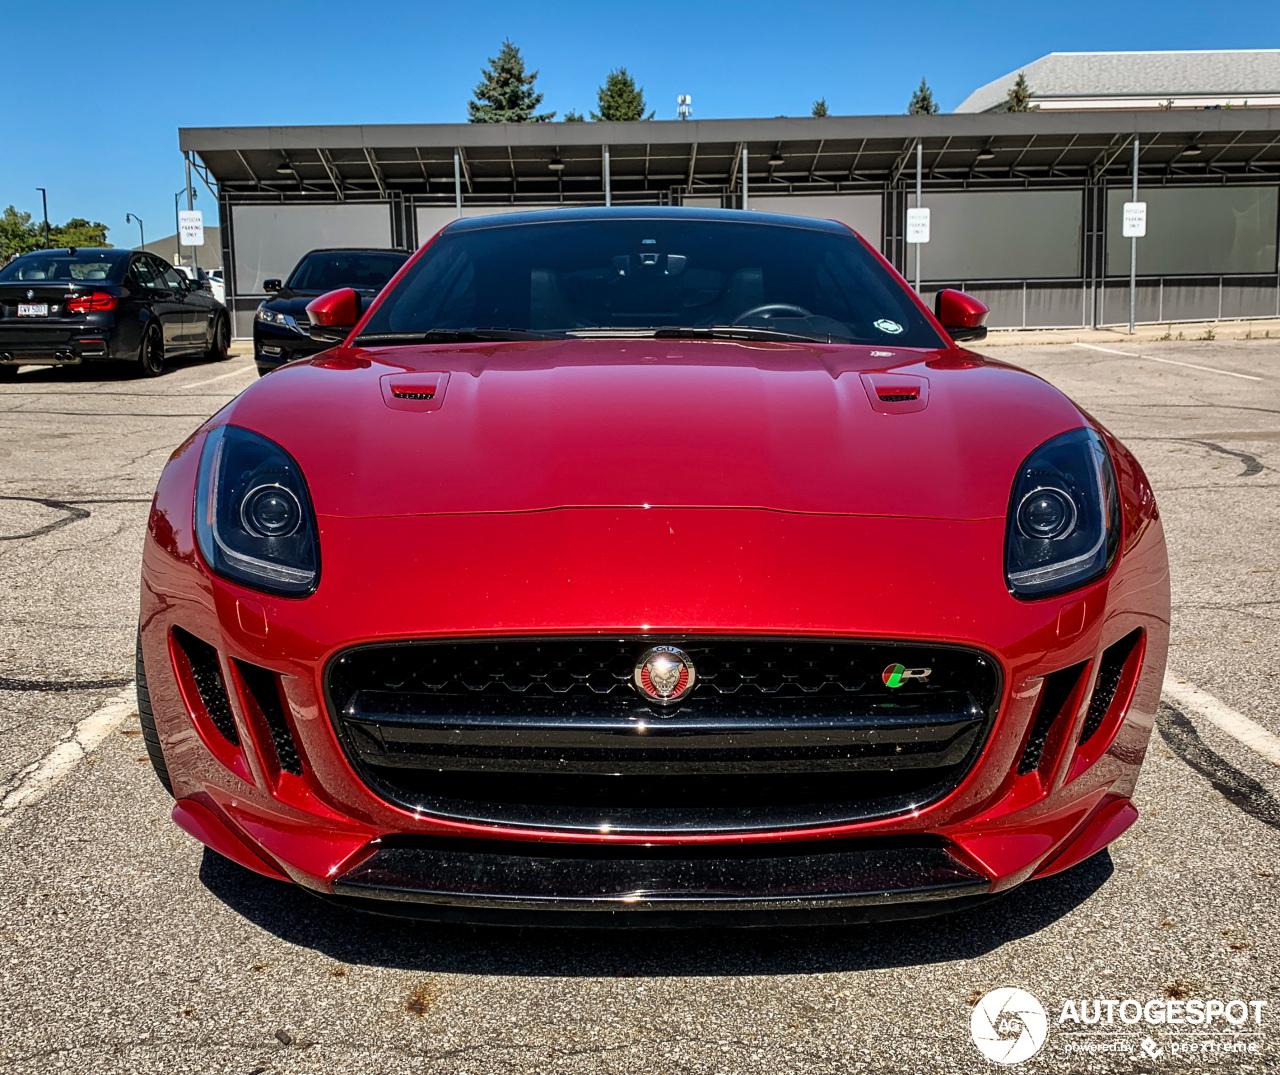 Jaguar F-TYPE R AWD Coupé - 16 September 2019 - Autogespot